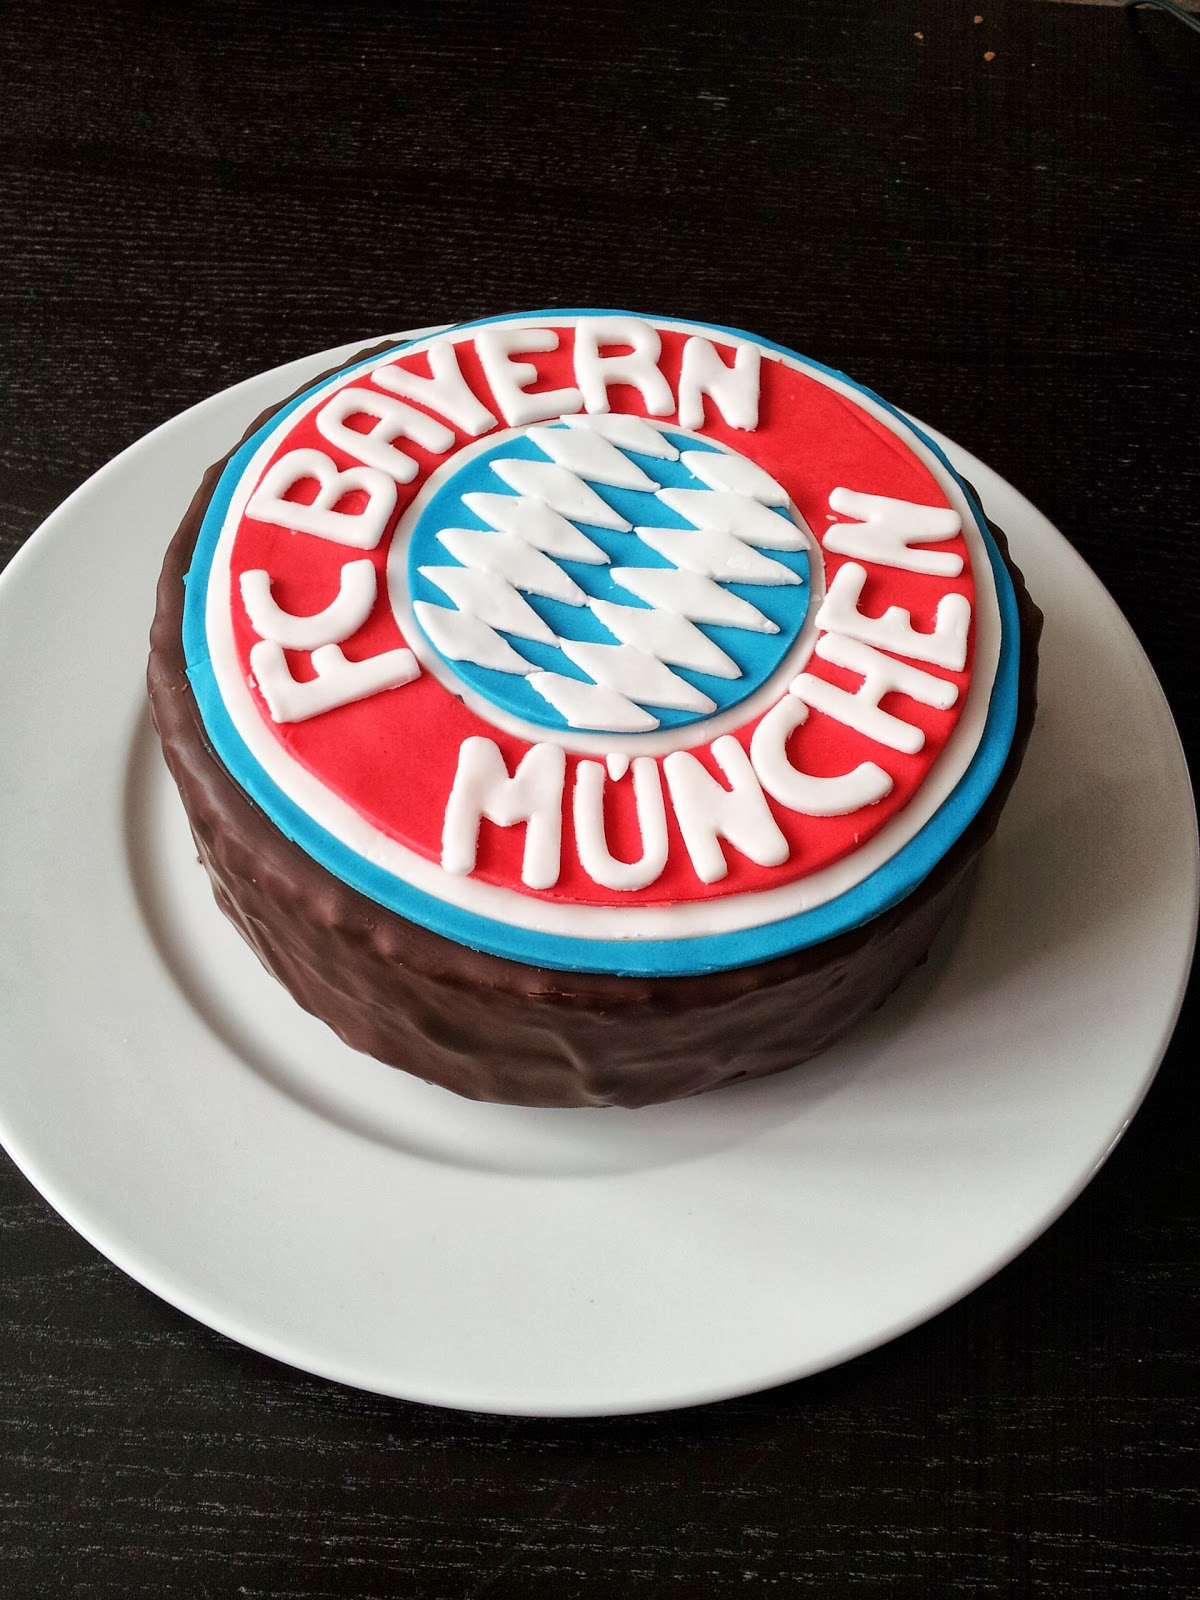 Karins Leckerer Backzauber Motivtorte Fc Bayern Munchen